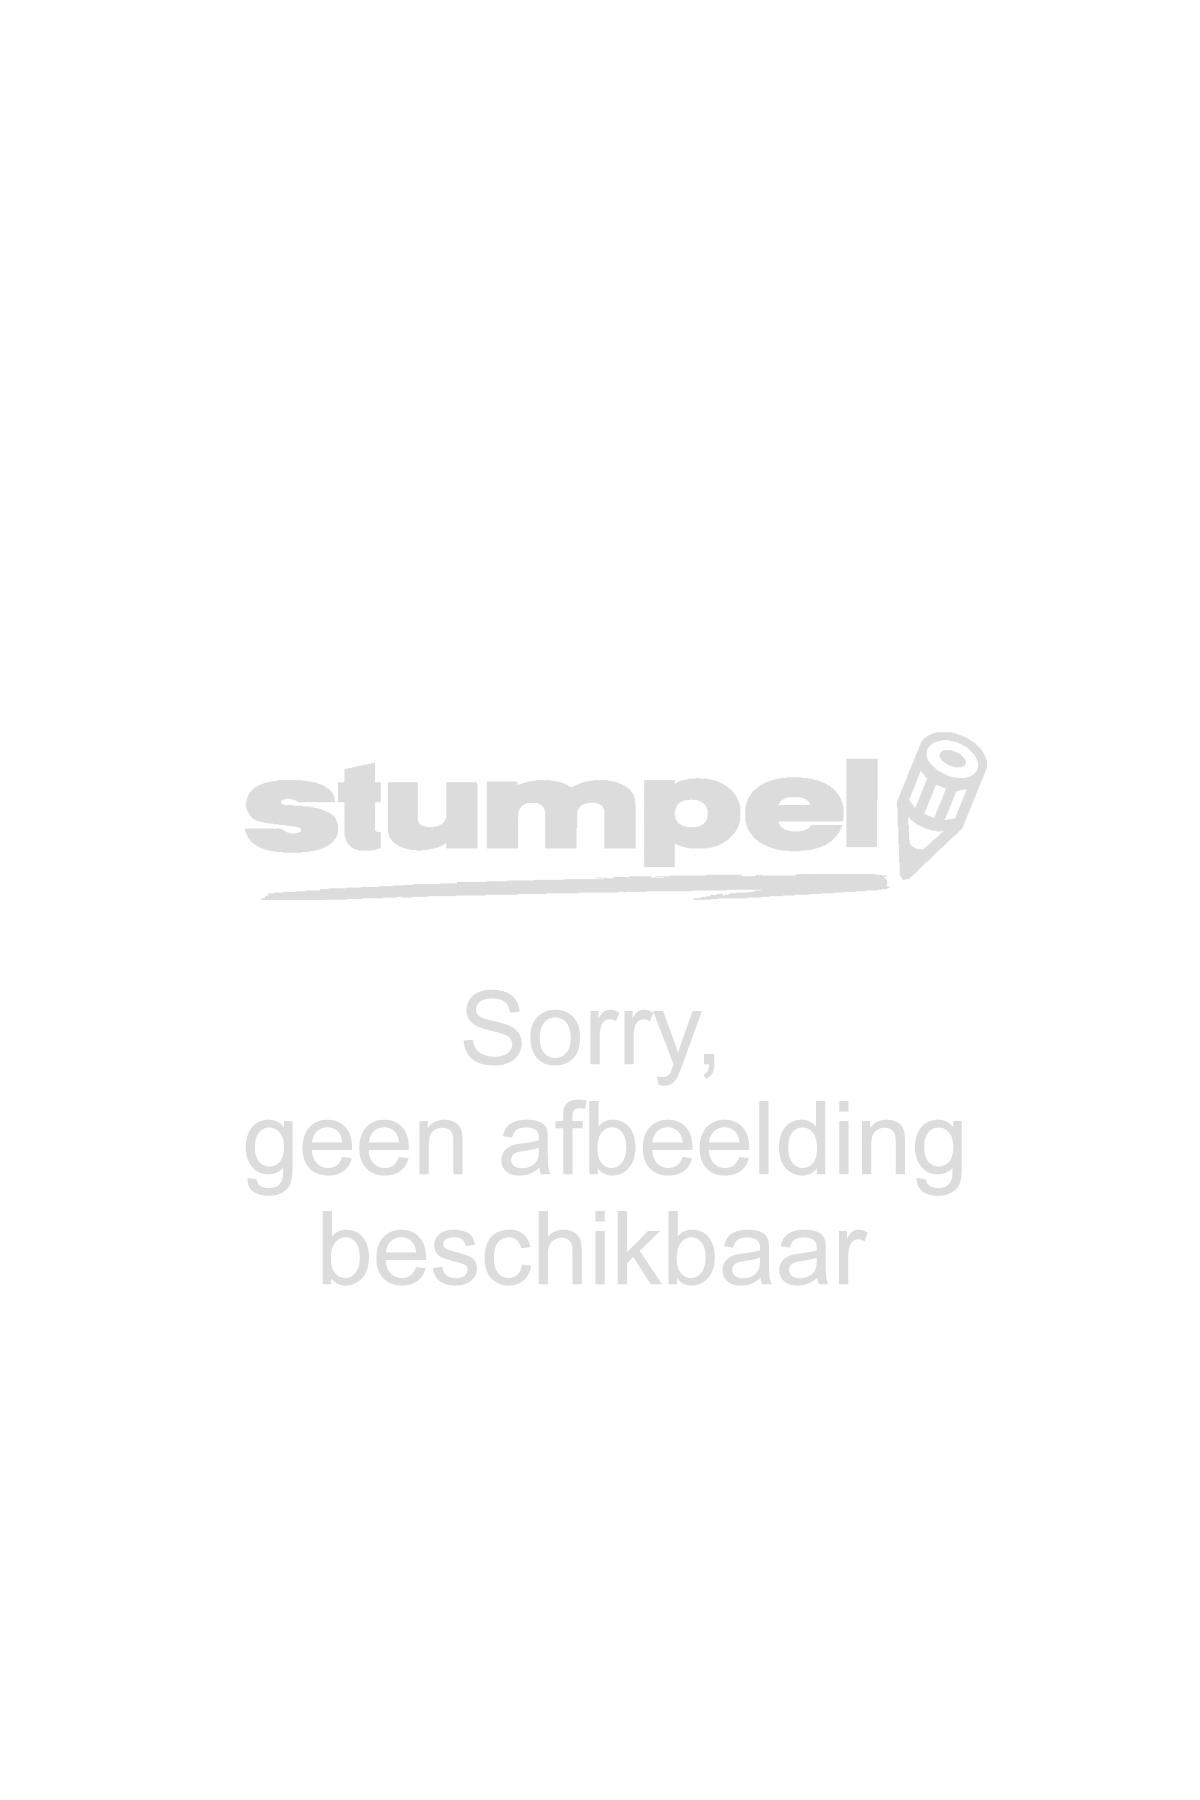 whiteboard-lega-proline-professional-magn-45x60cm-920215